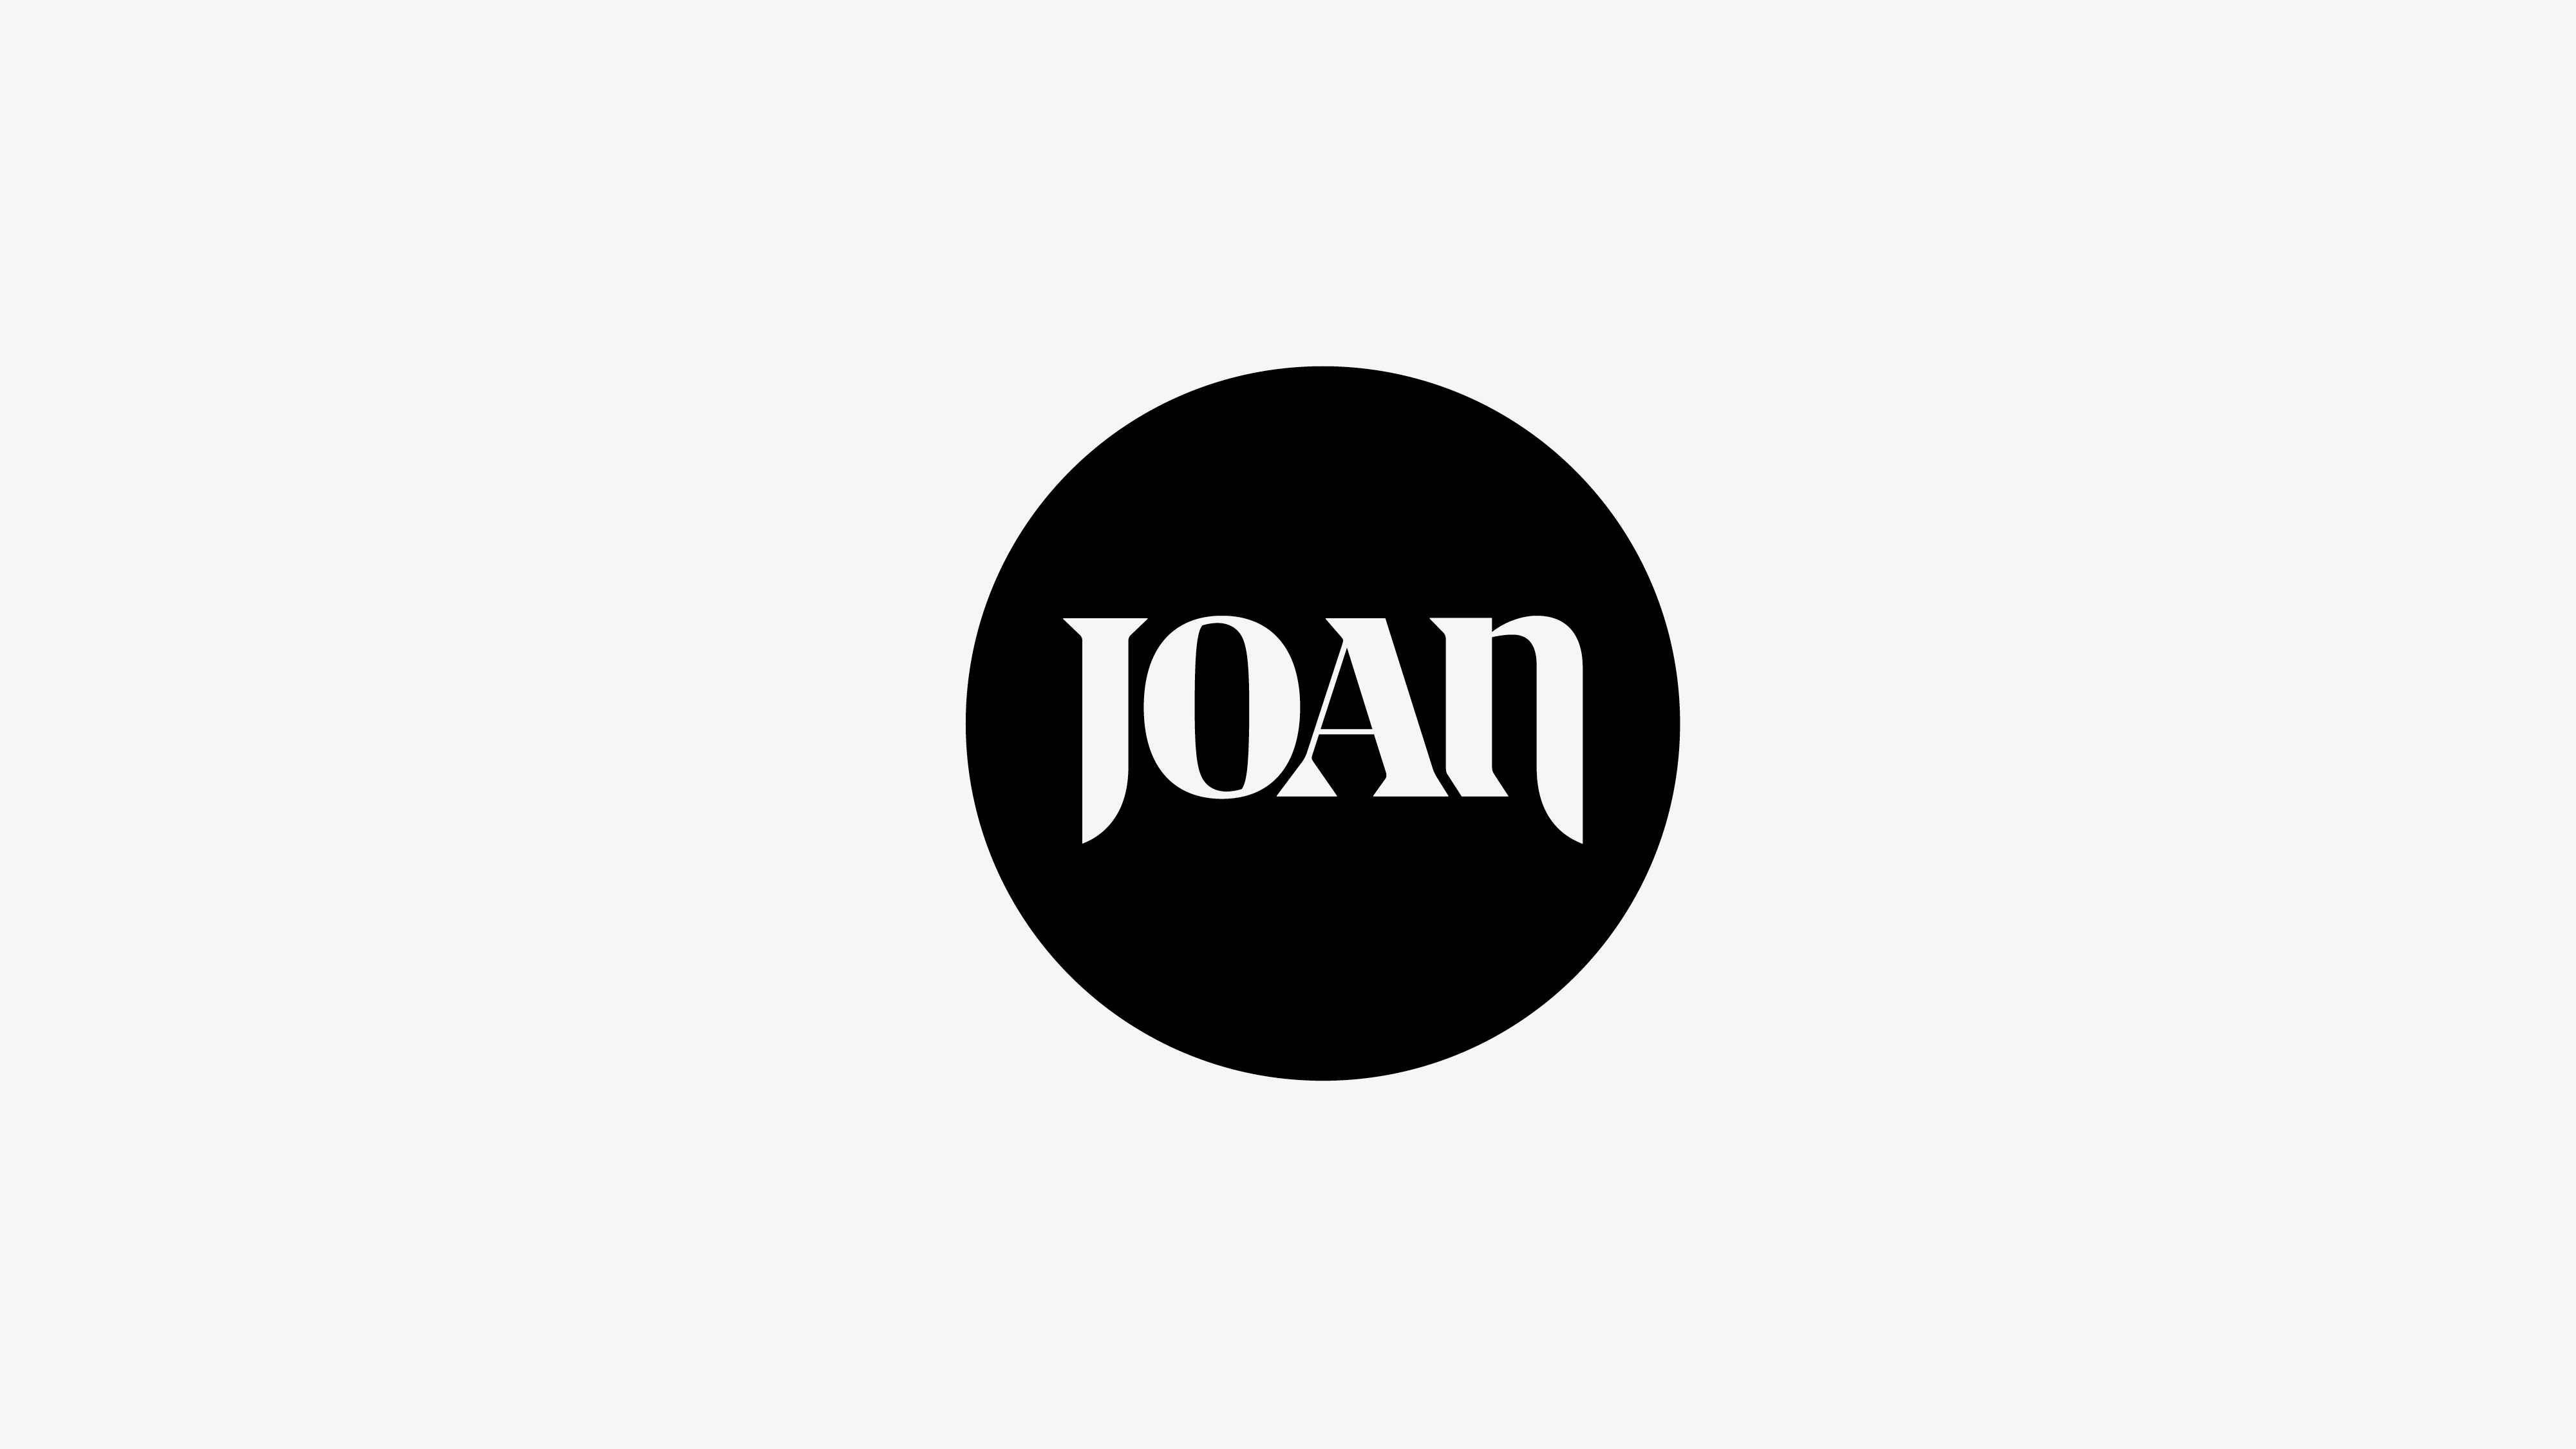 Joan id